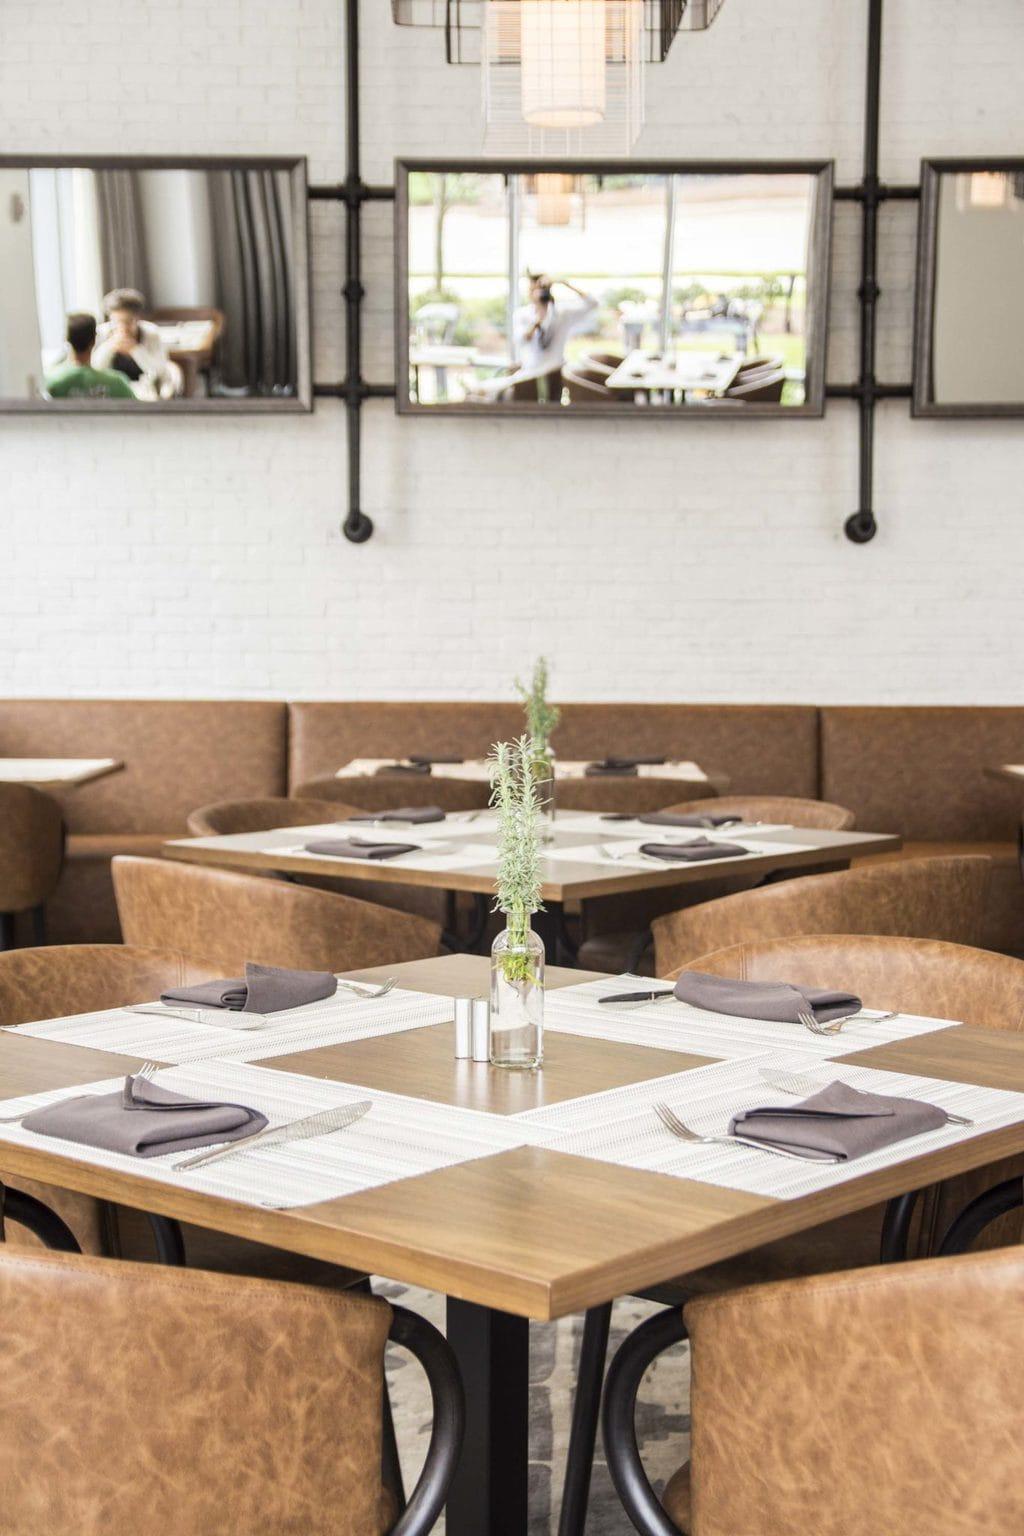 Hickory & Hazel restaurant at the Renaissance Atlanta airport hotel on Thou Swell @thouswellblog